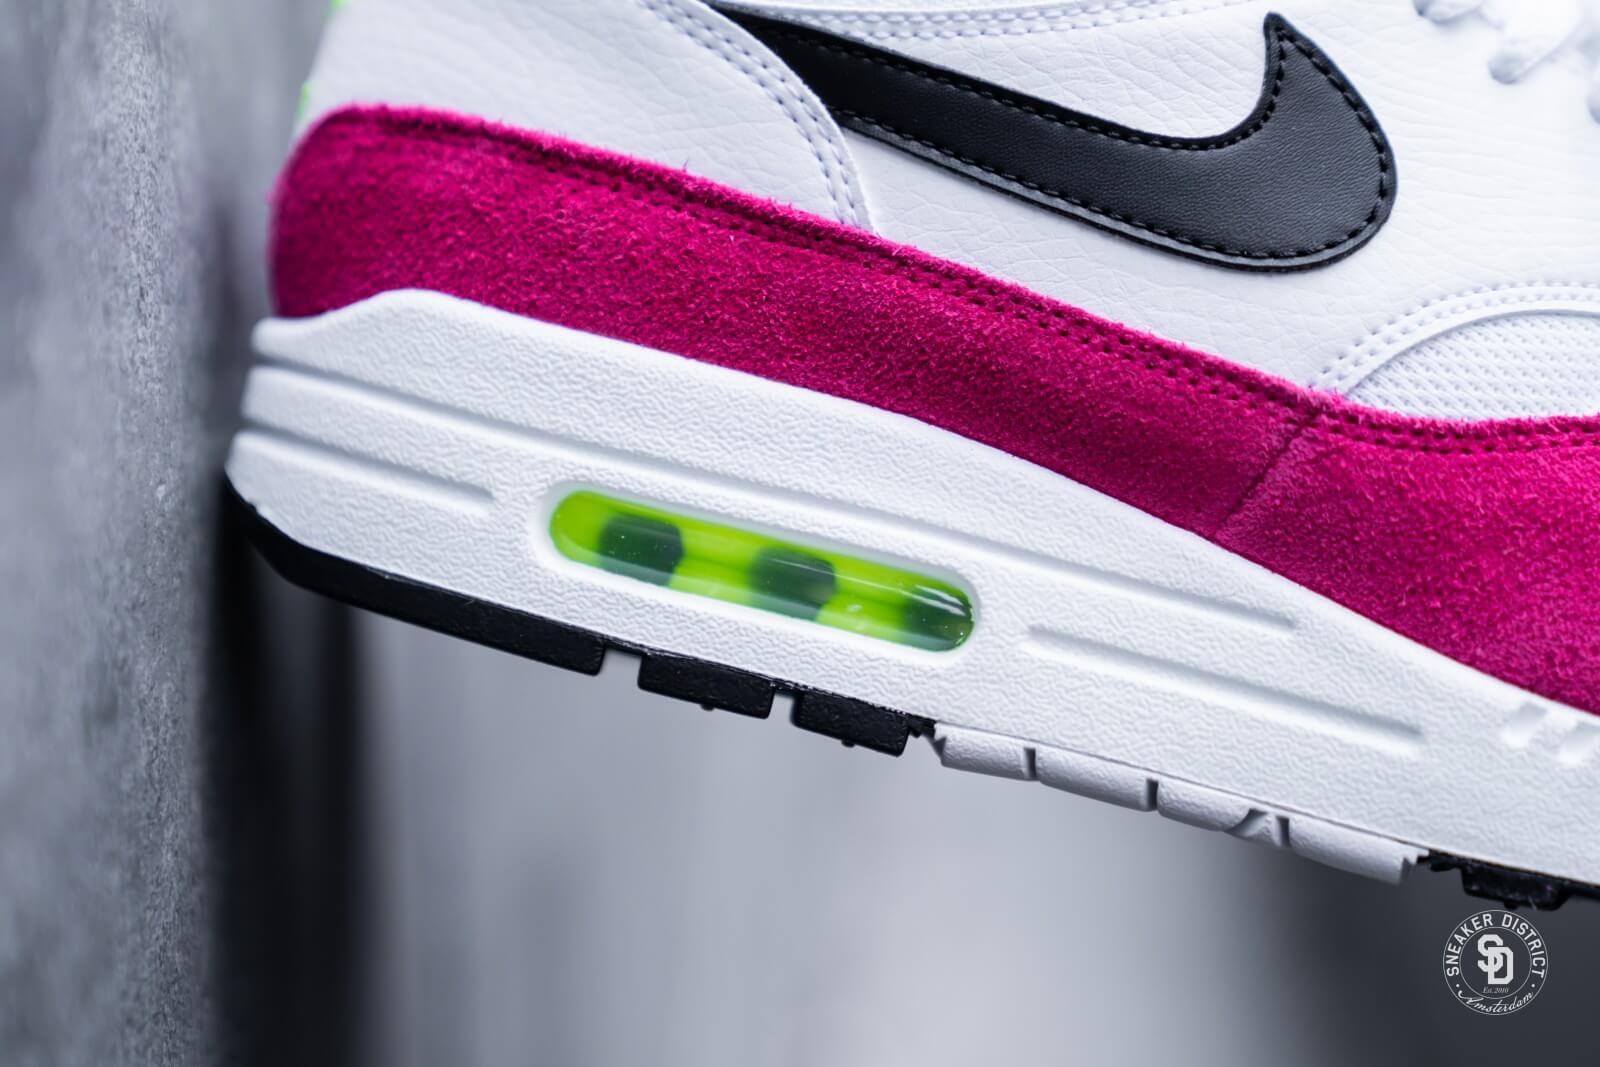 Nike Air Max 1 White/Black Volt-Pink